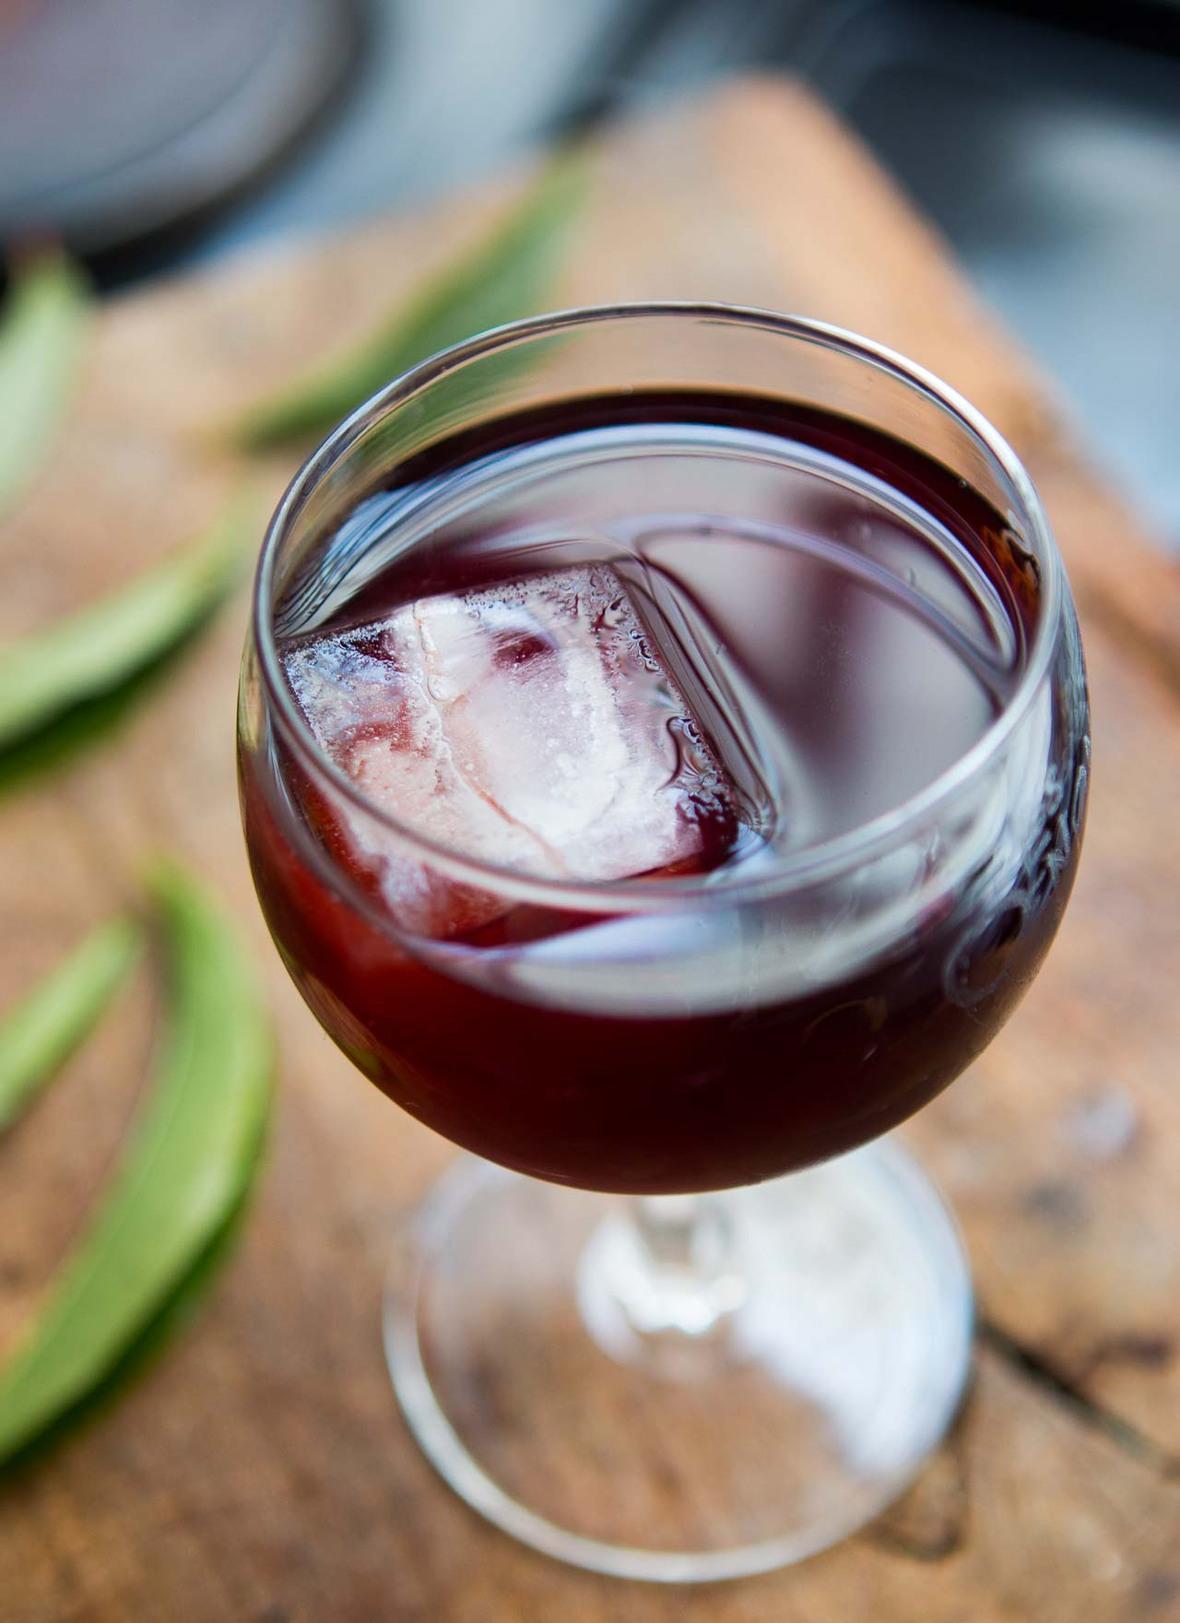 Vin de peche peach leaf wine recipe recette-3